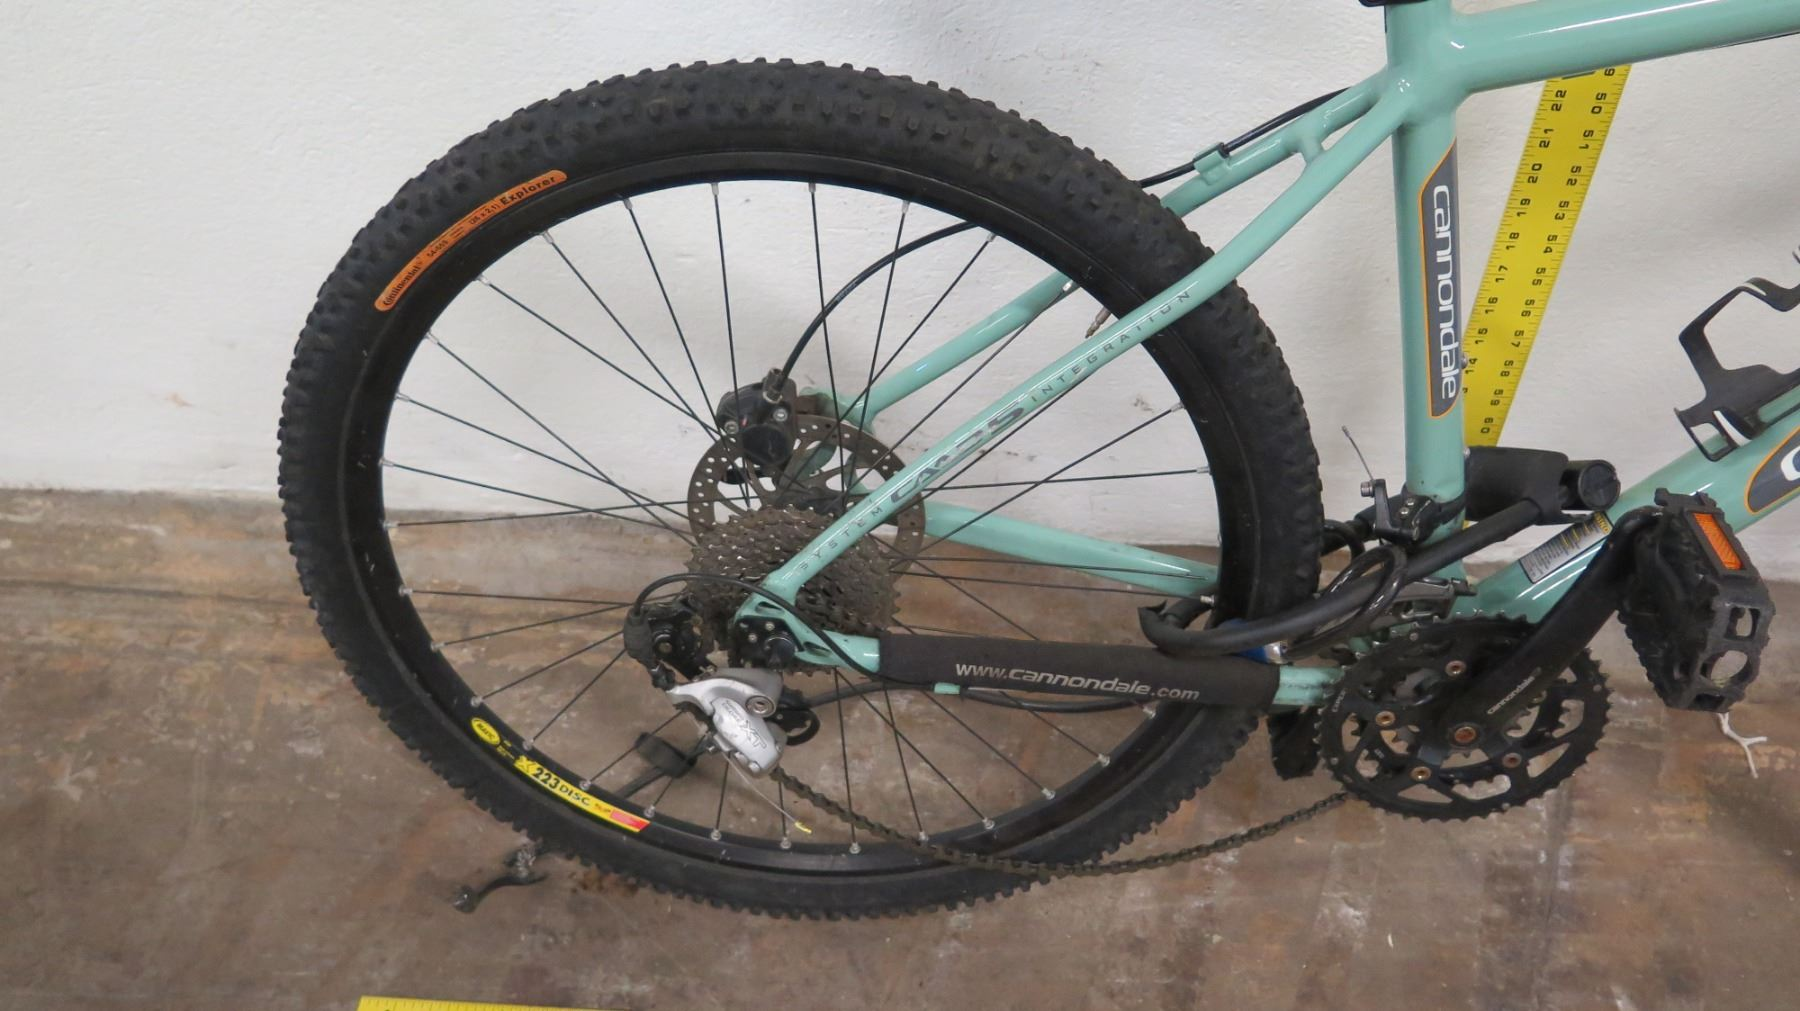 45ab886b4e8 ... Image 2 : Cannondale F800 Defore XT Headshock Si Lefty Mountain Bike,  Shimano, Blue ...